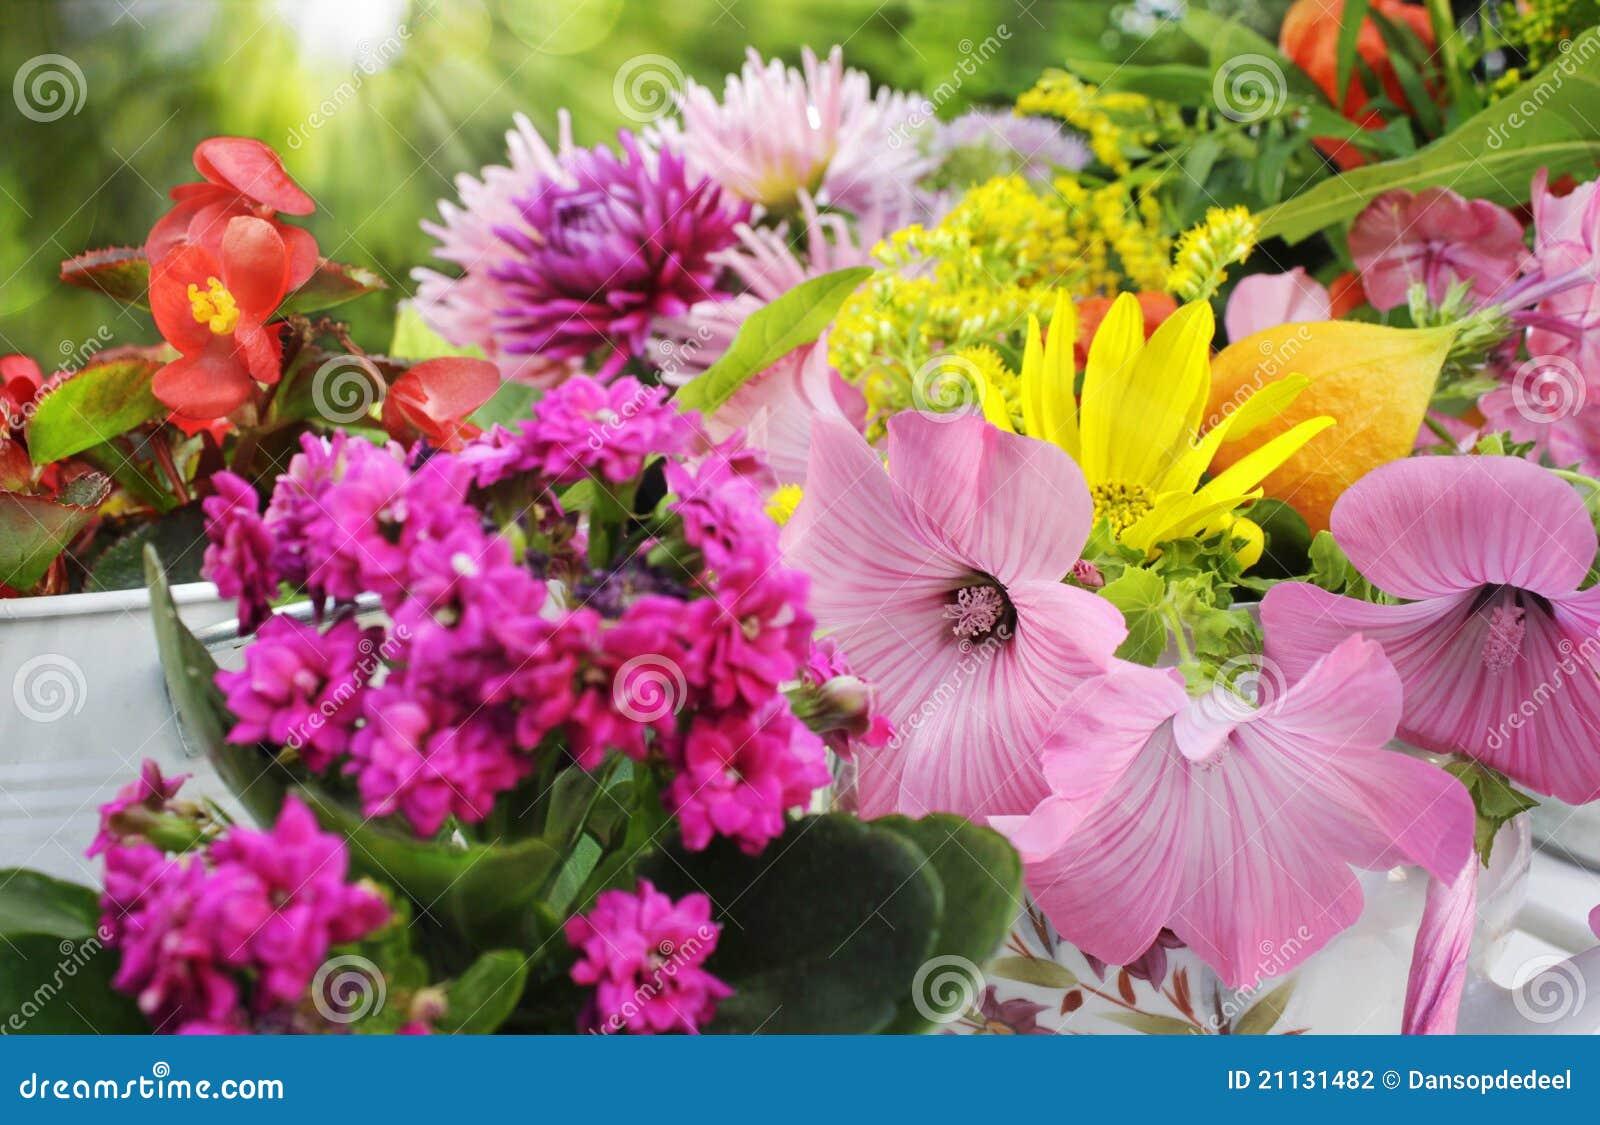 Sunny Garden Flower Arrangement Stock Photography Image